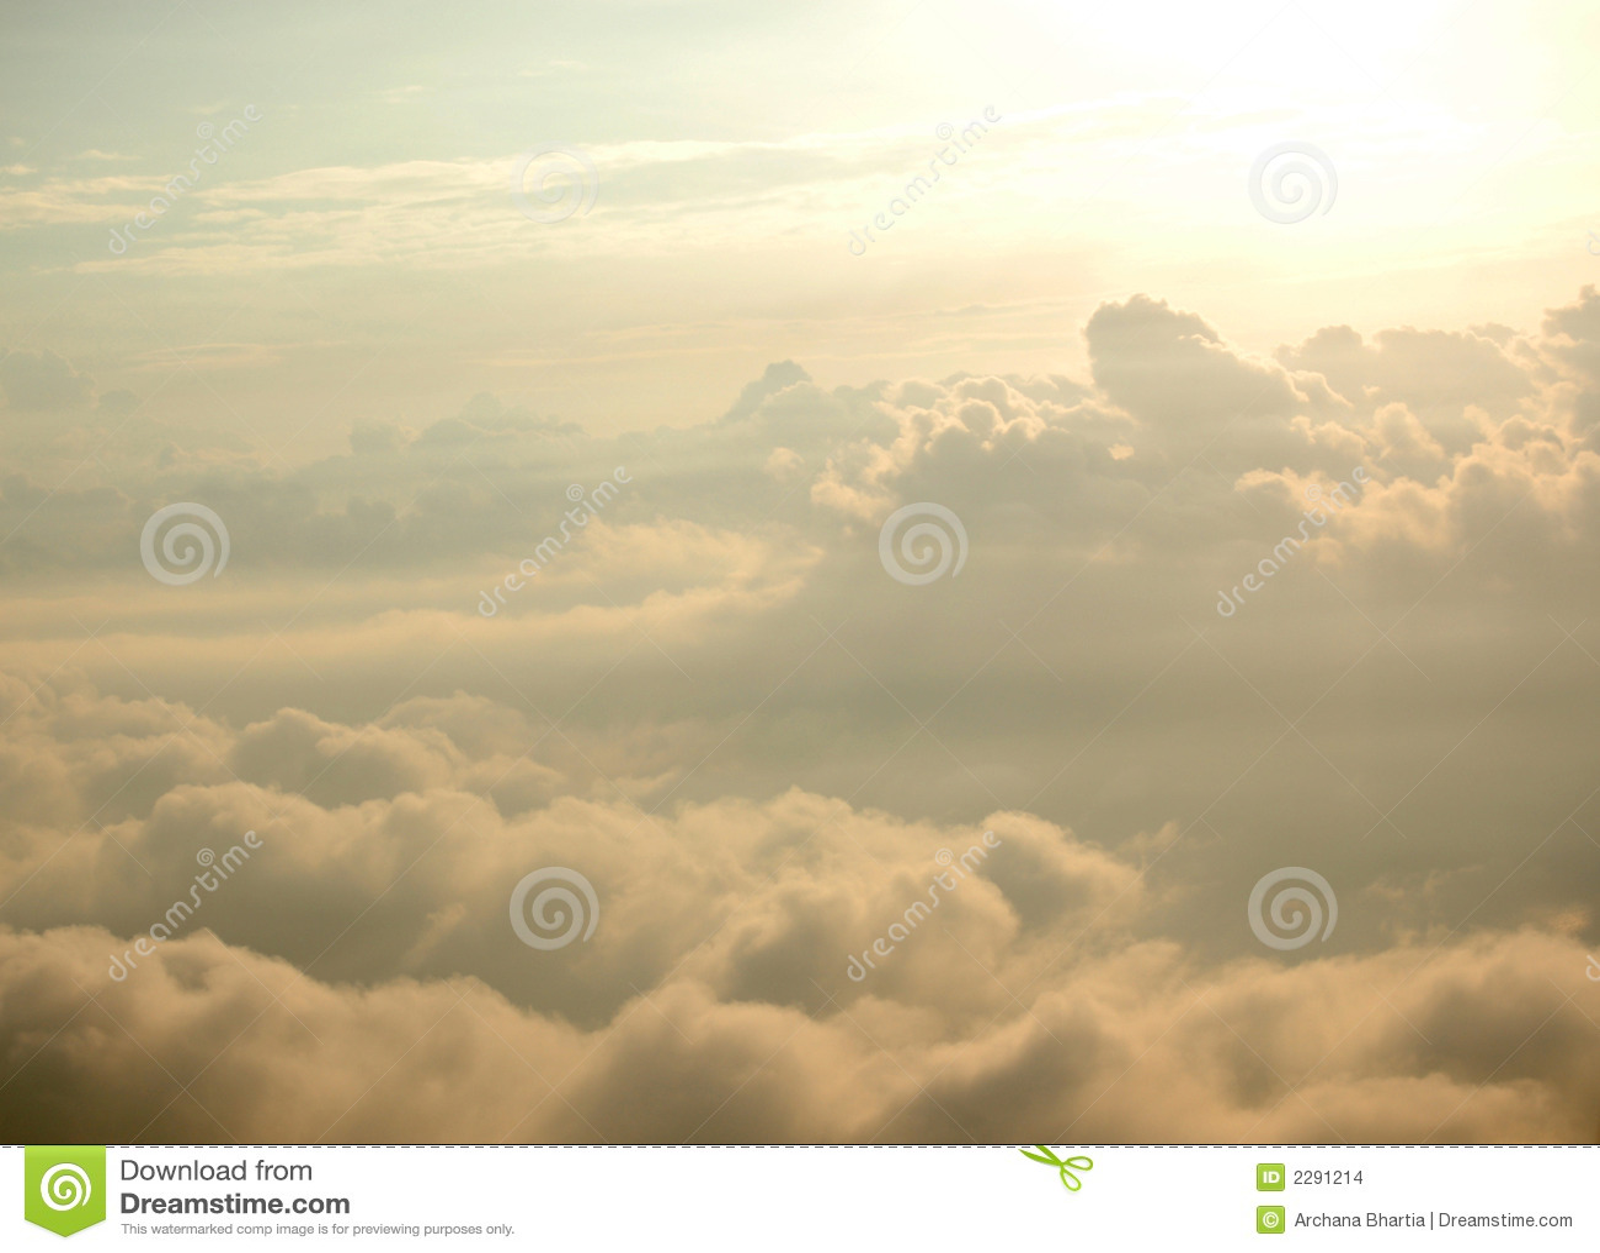 Heaven like skyscape